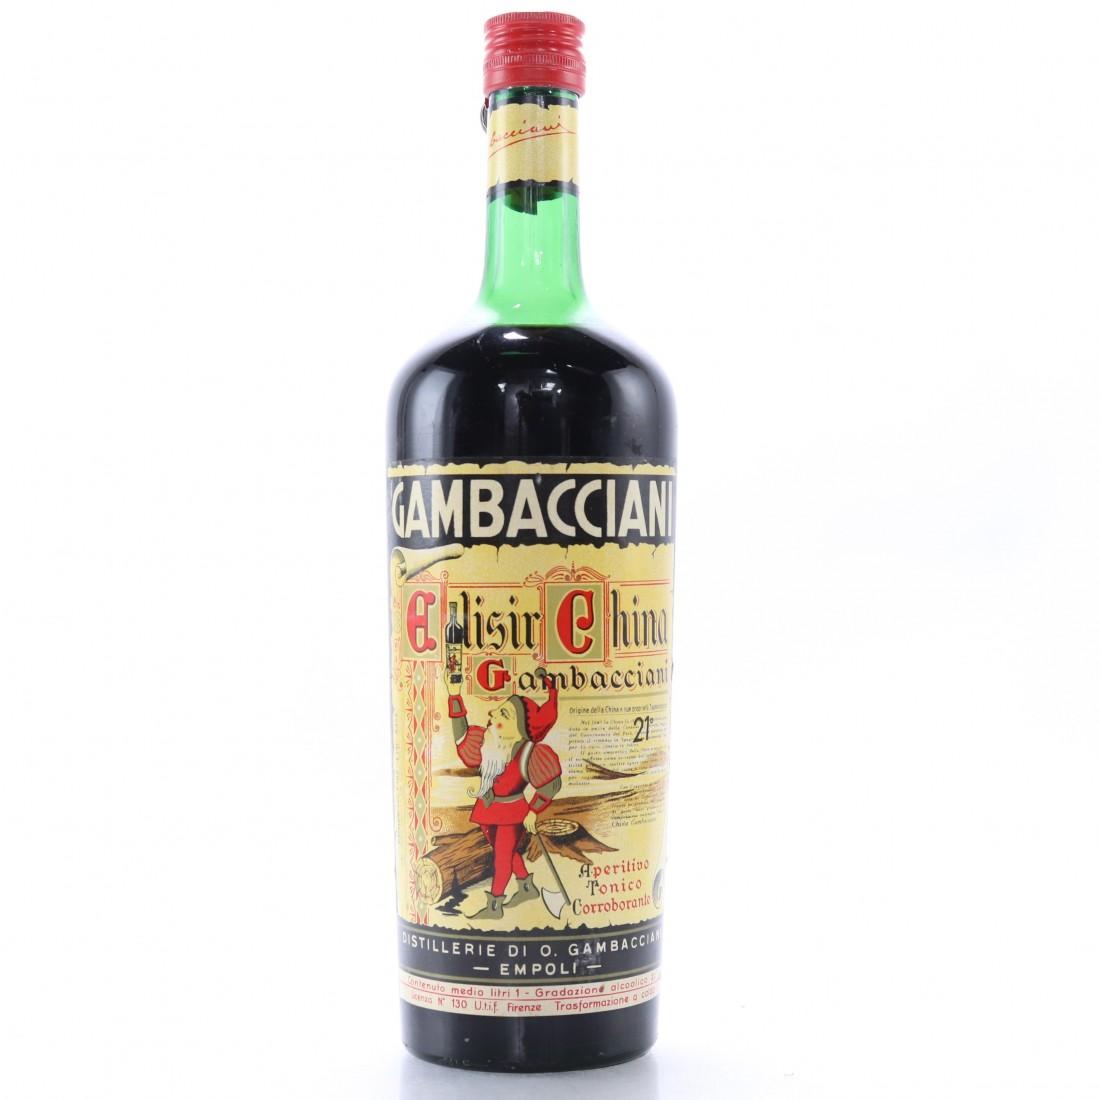 Gambacciani Elisir China 1 Litre 1950s